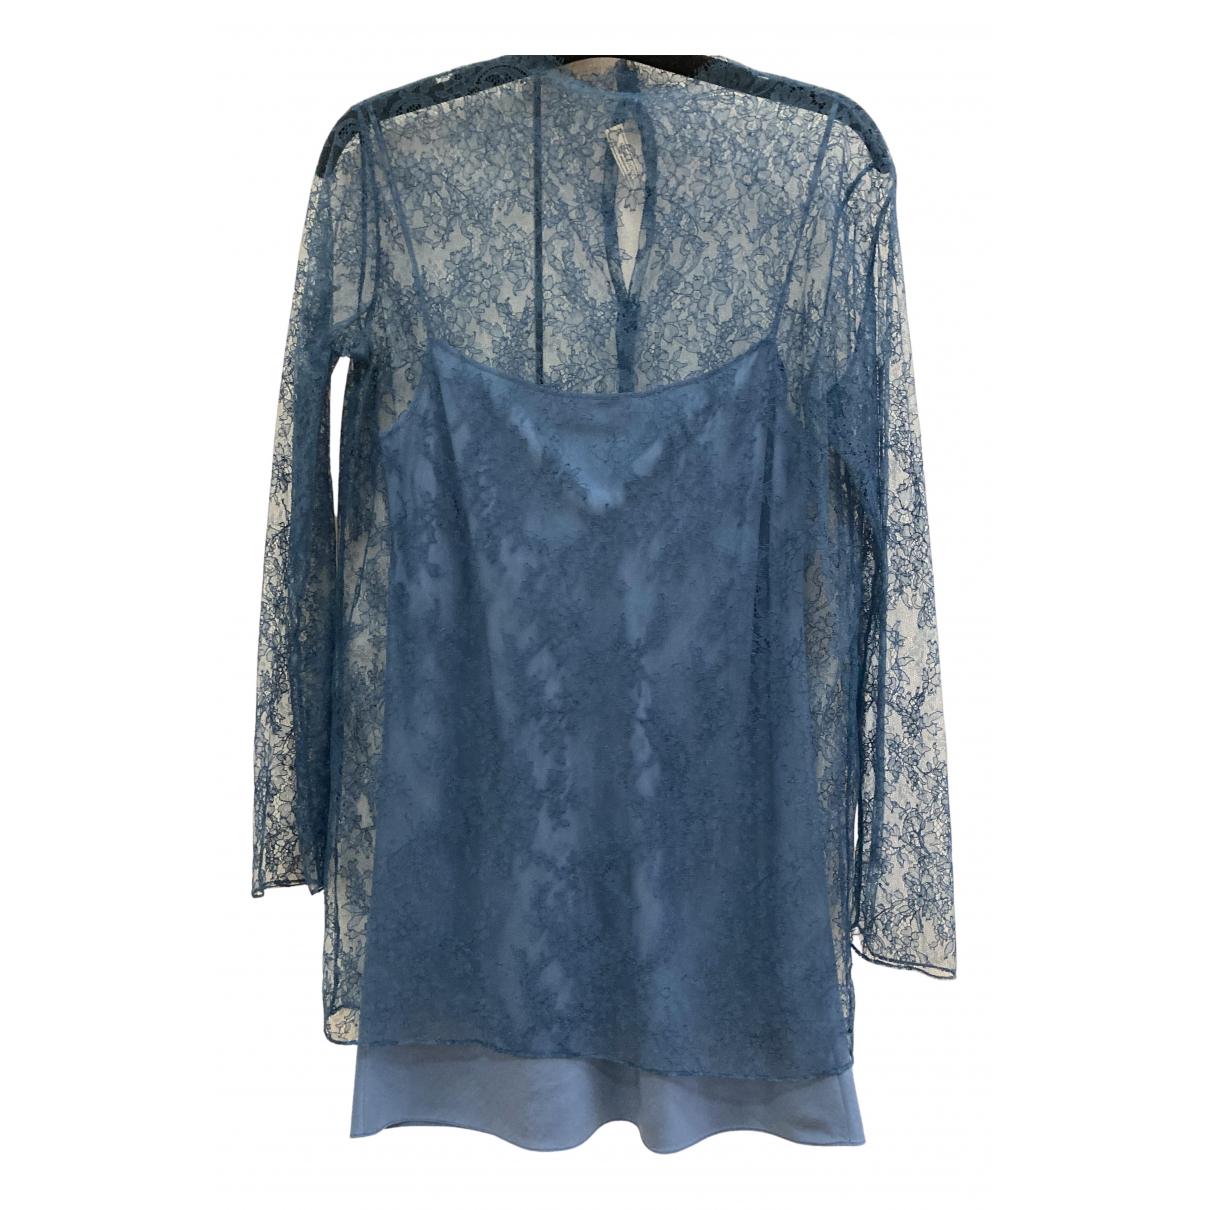 Nina Ricci - Top   pour femme en dentelle - bleu